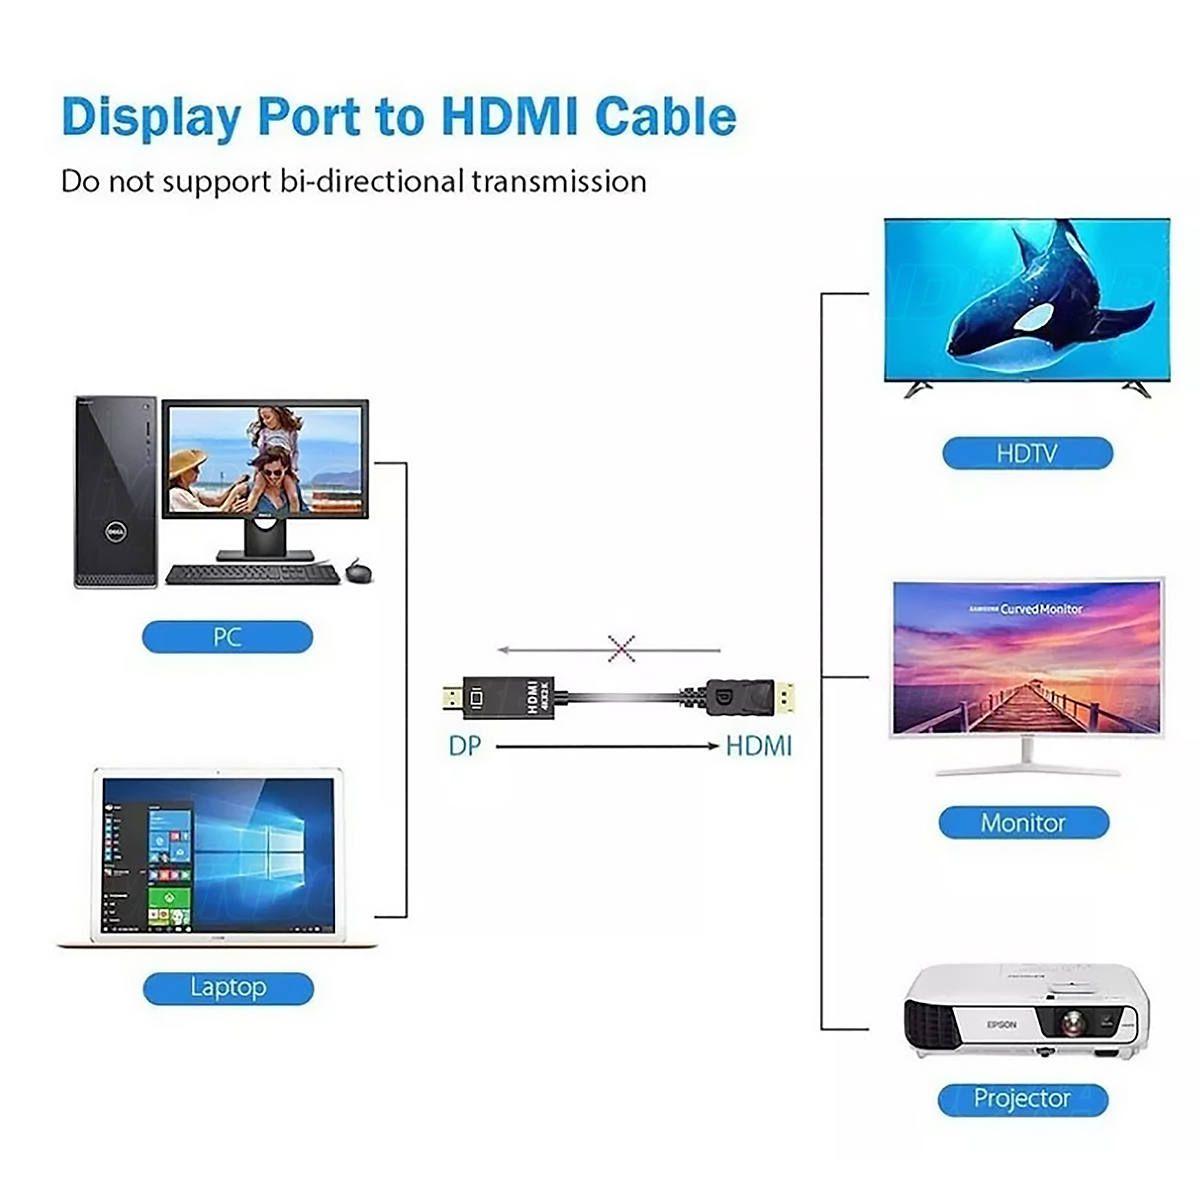 Cabo Conversor Adaptador Displayport para HDMI 1.8 metros CB-DMI18 1244 Preto